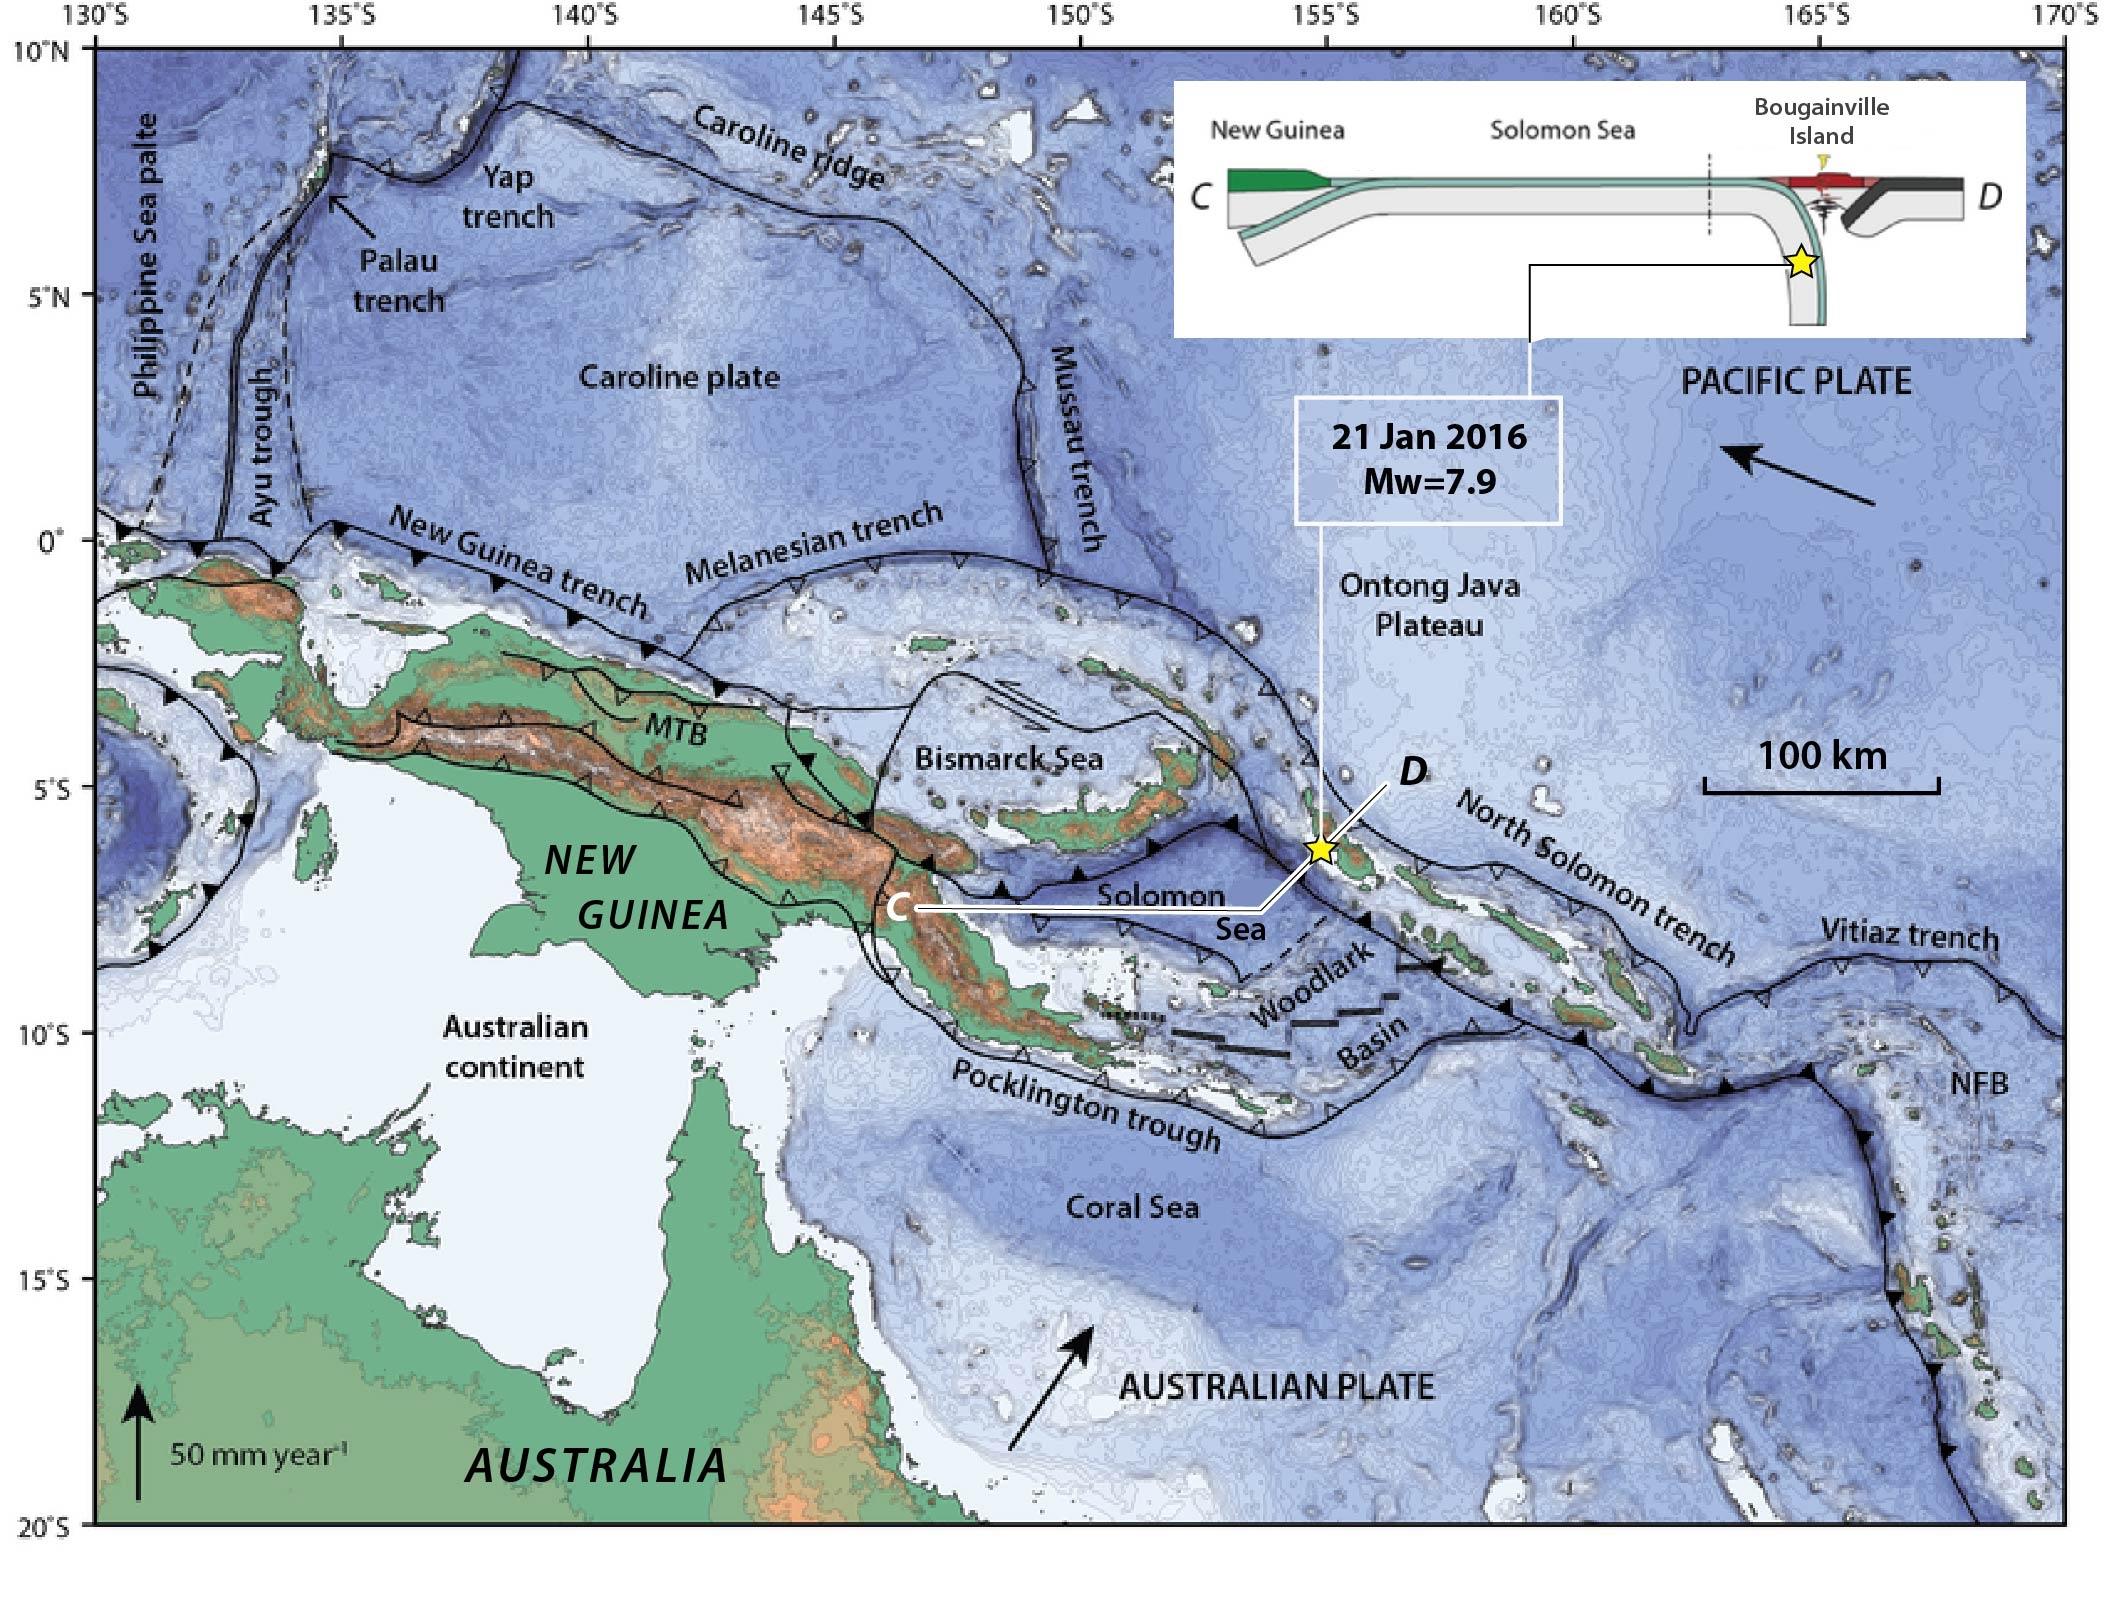 Papuanewguineafaultmapearthquakemap Temblornet - Papua new guinea map